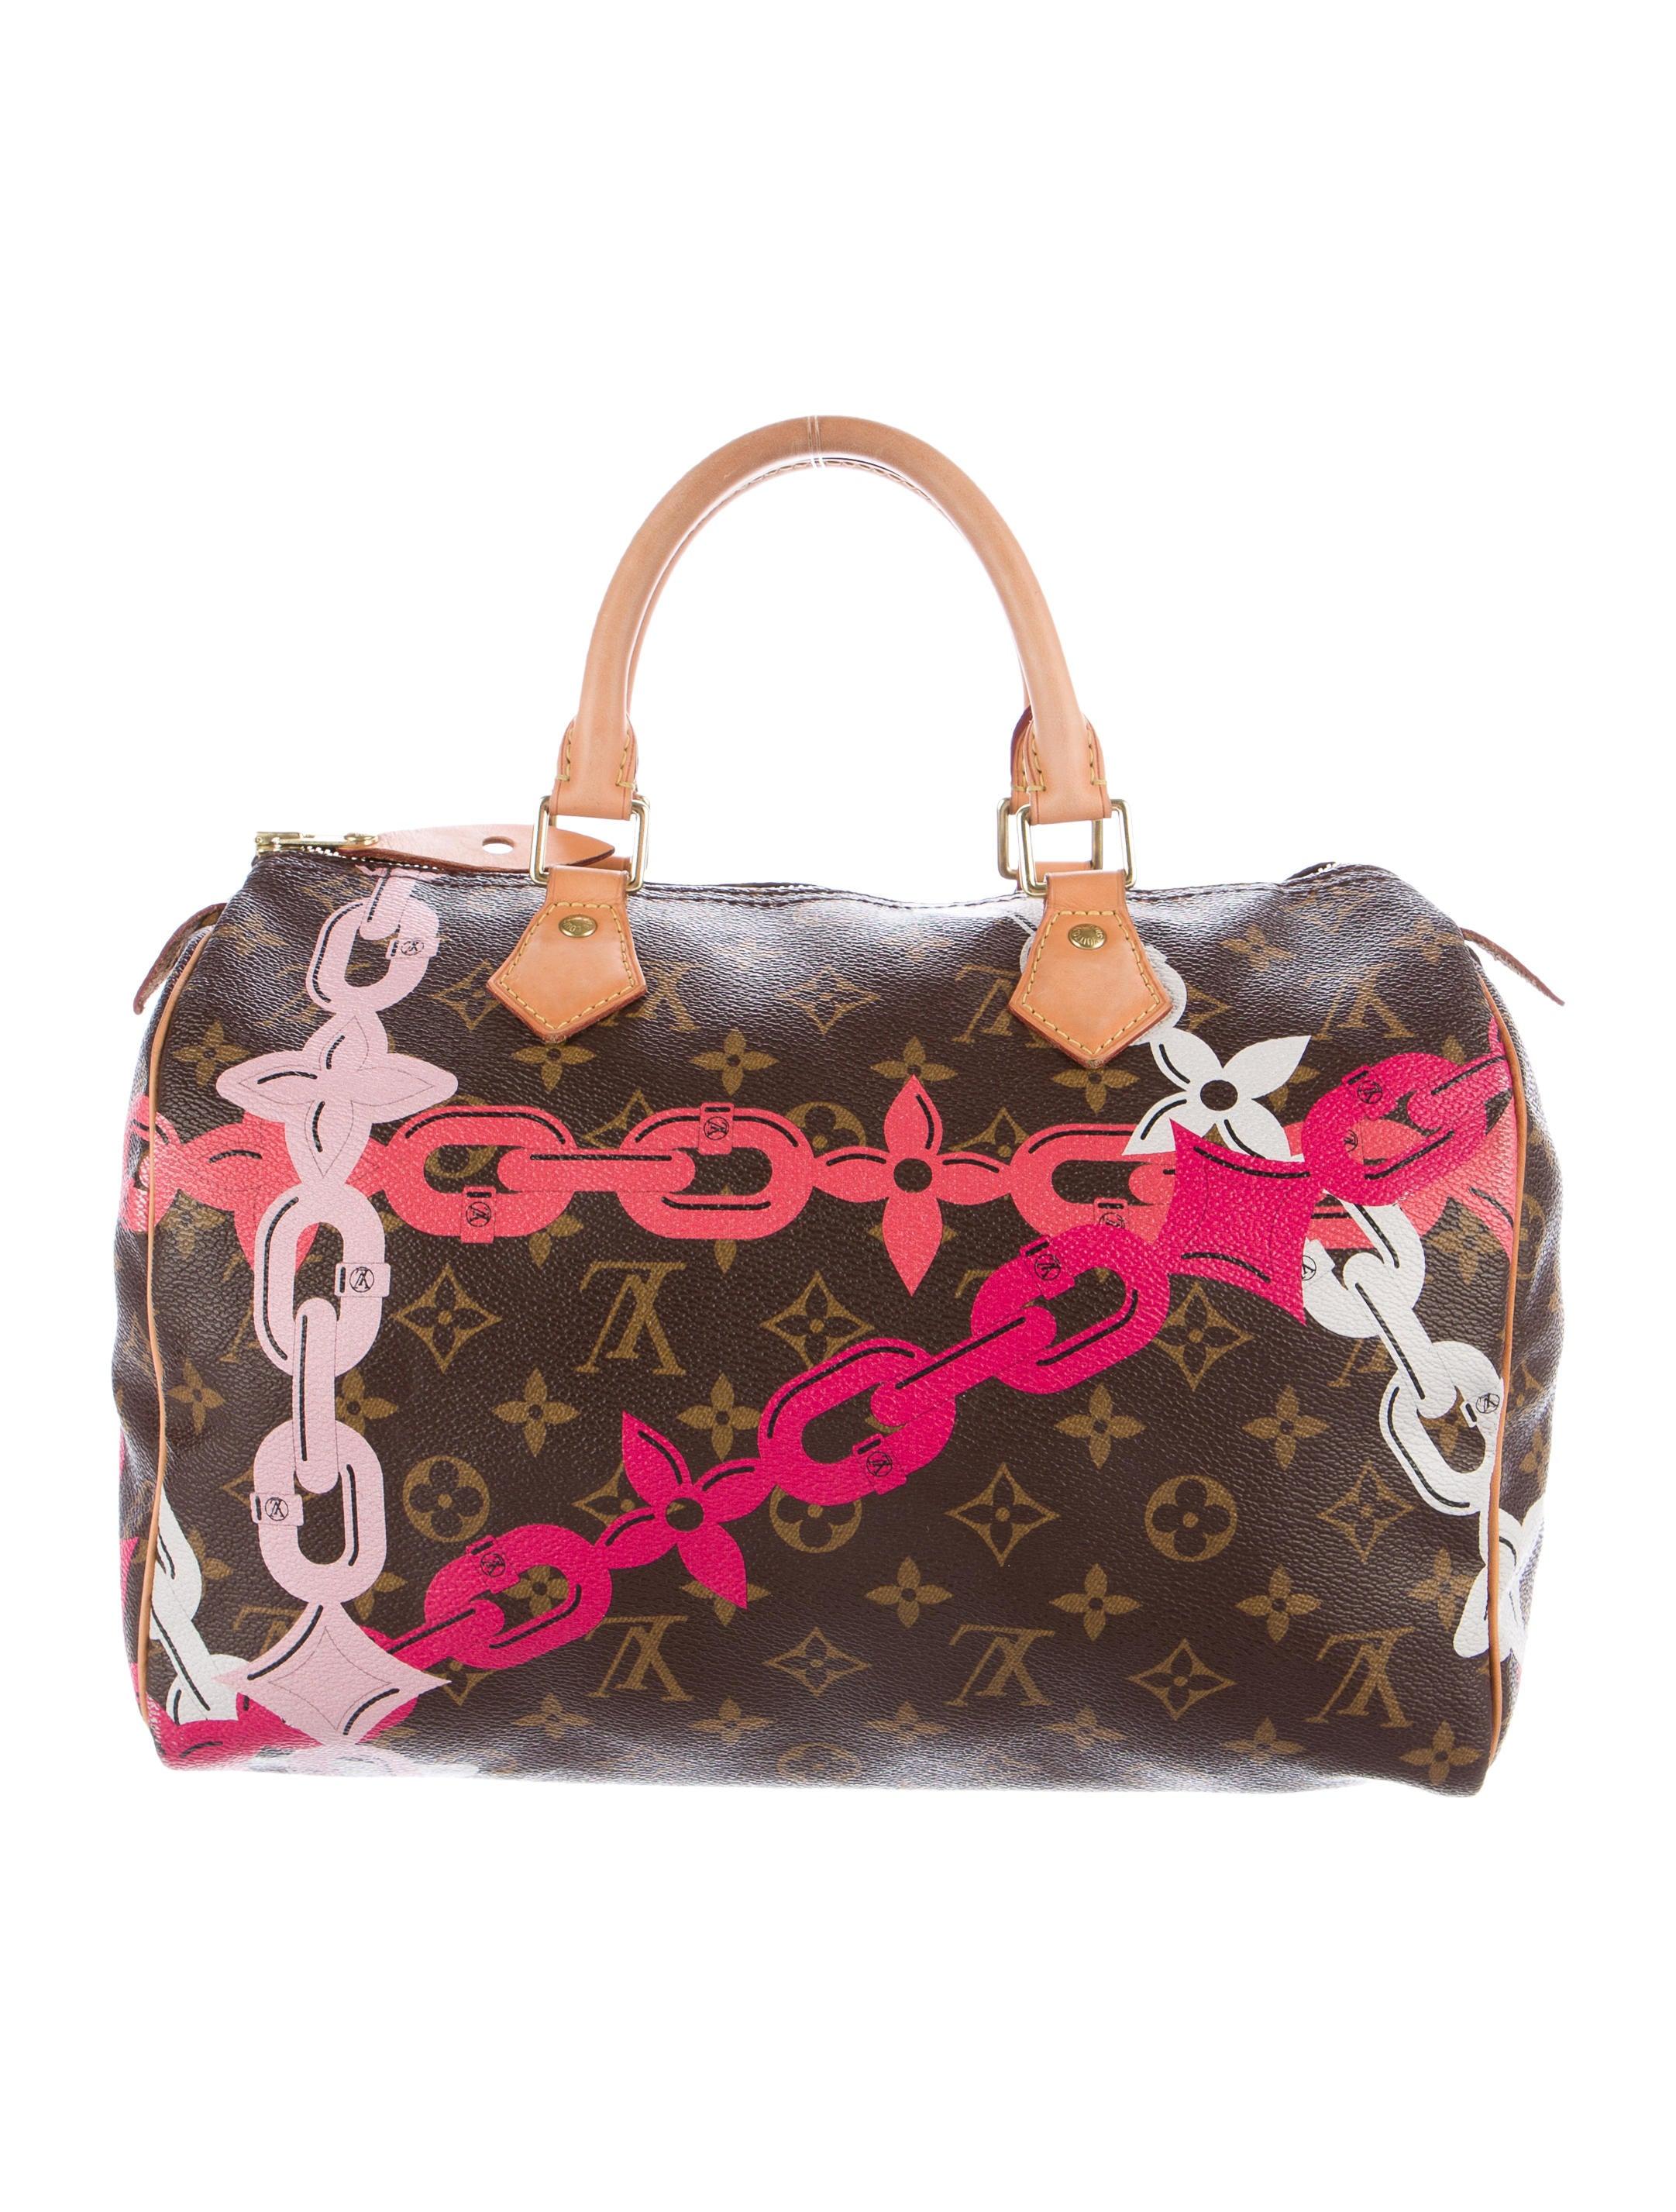 Louis Vuitton 2016 Monogram Chain Flower Speedy 30 Handbags Lou107423 The Realreal